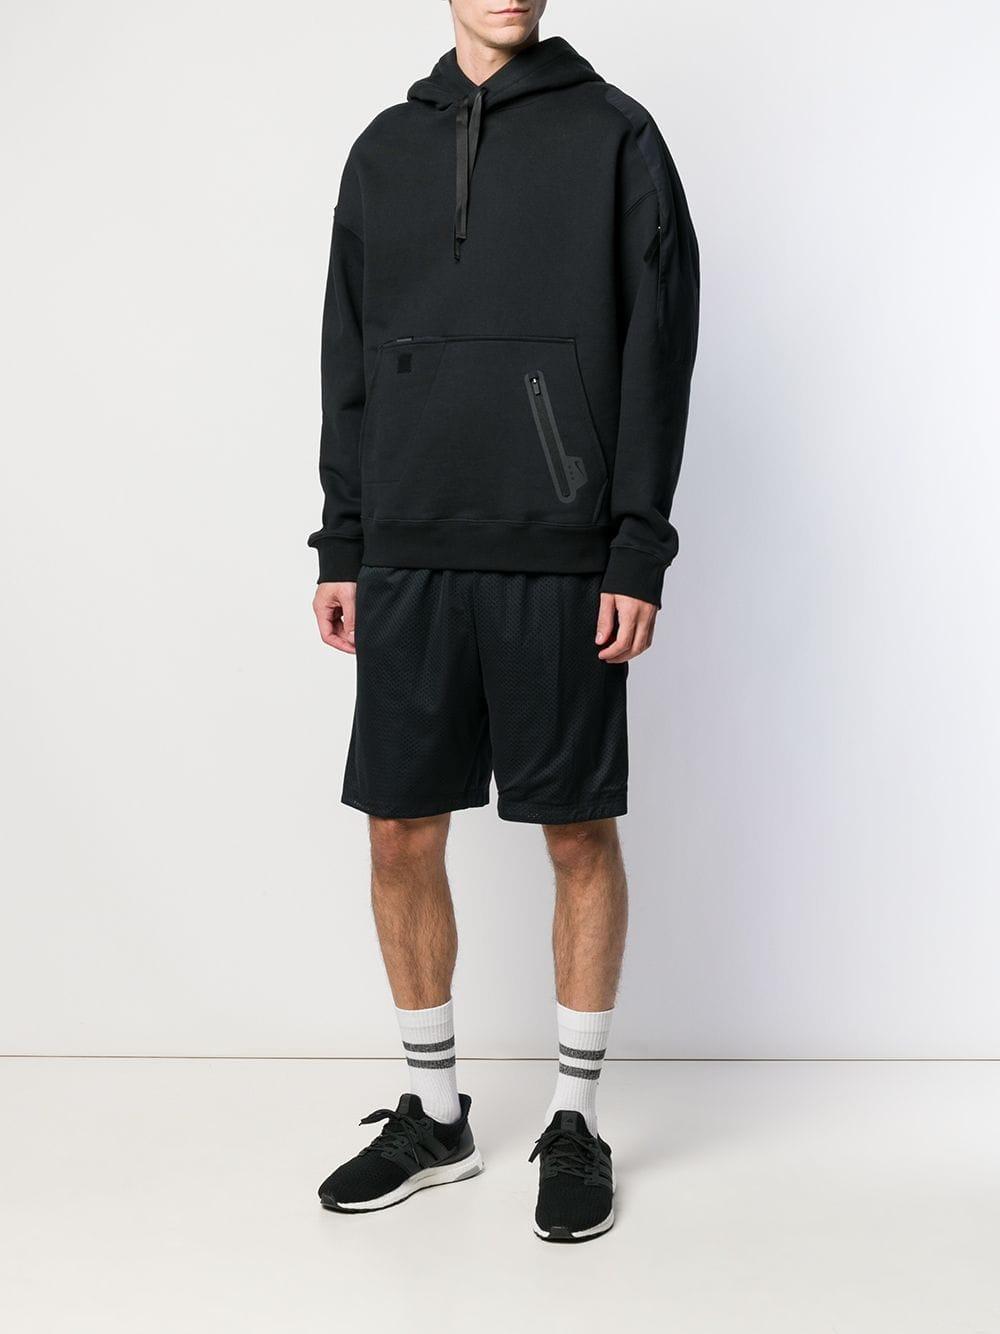 27be90257c01 Nike Jordan Track Shorts in Black for Men - Lyst